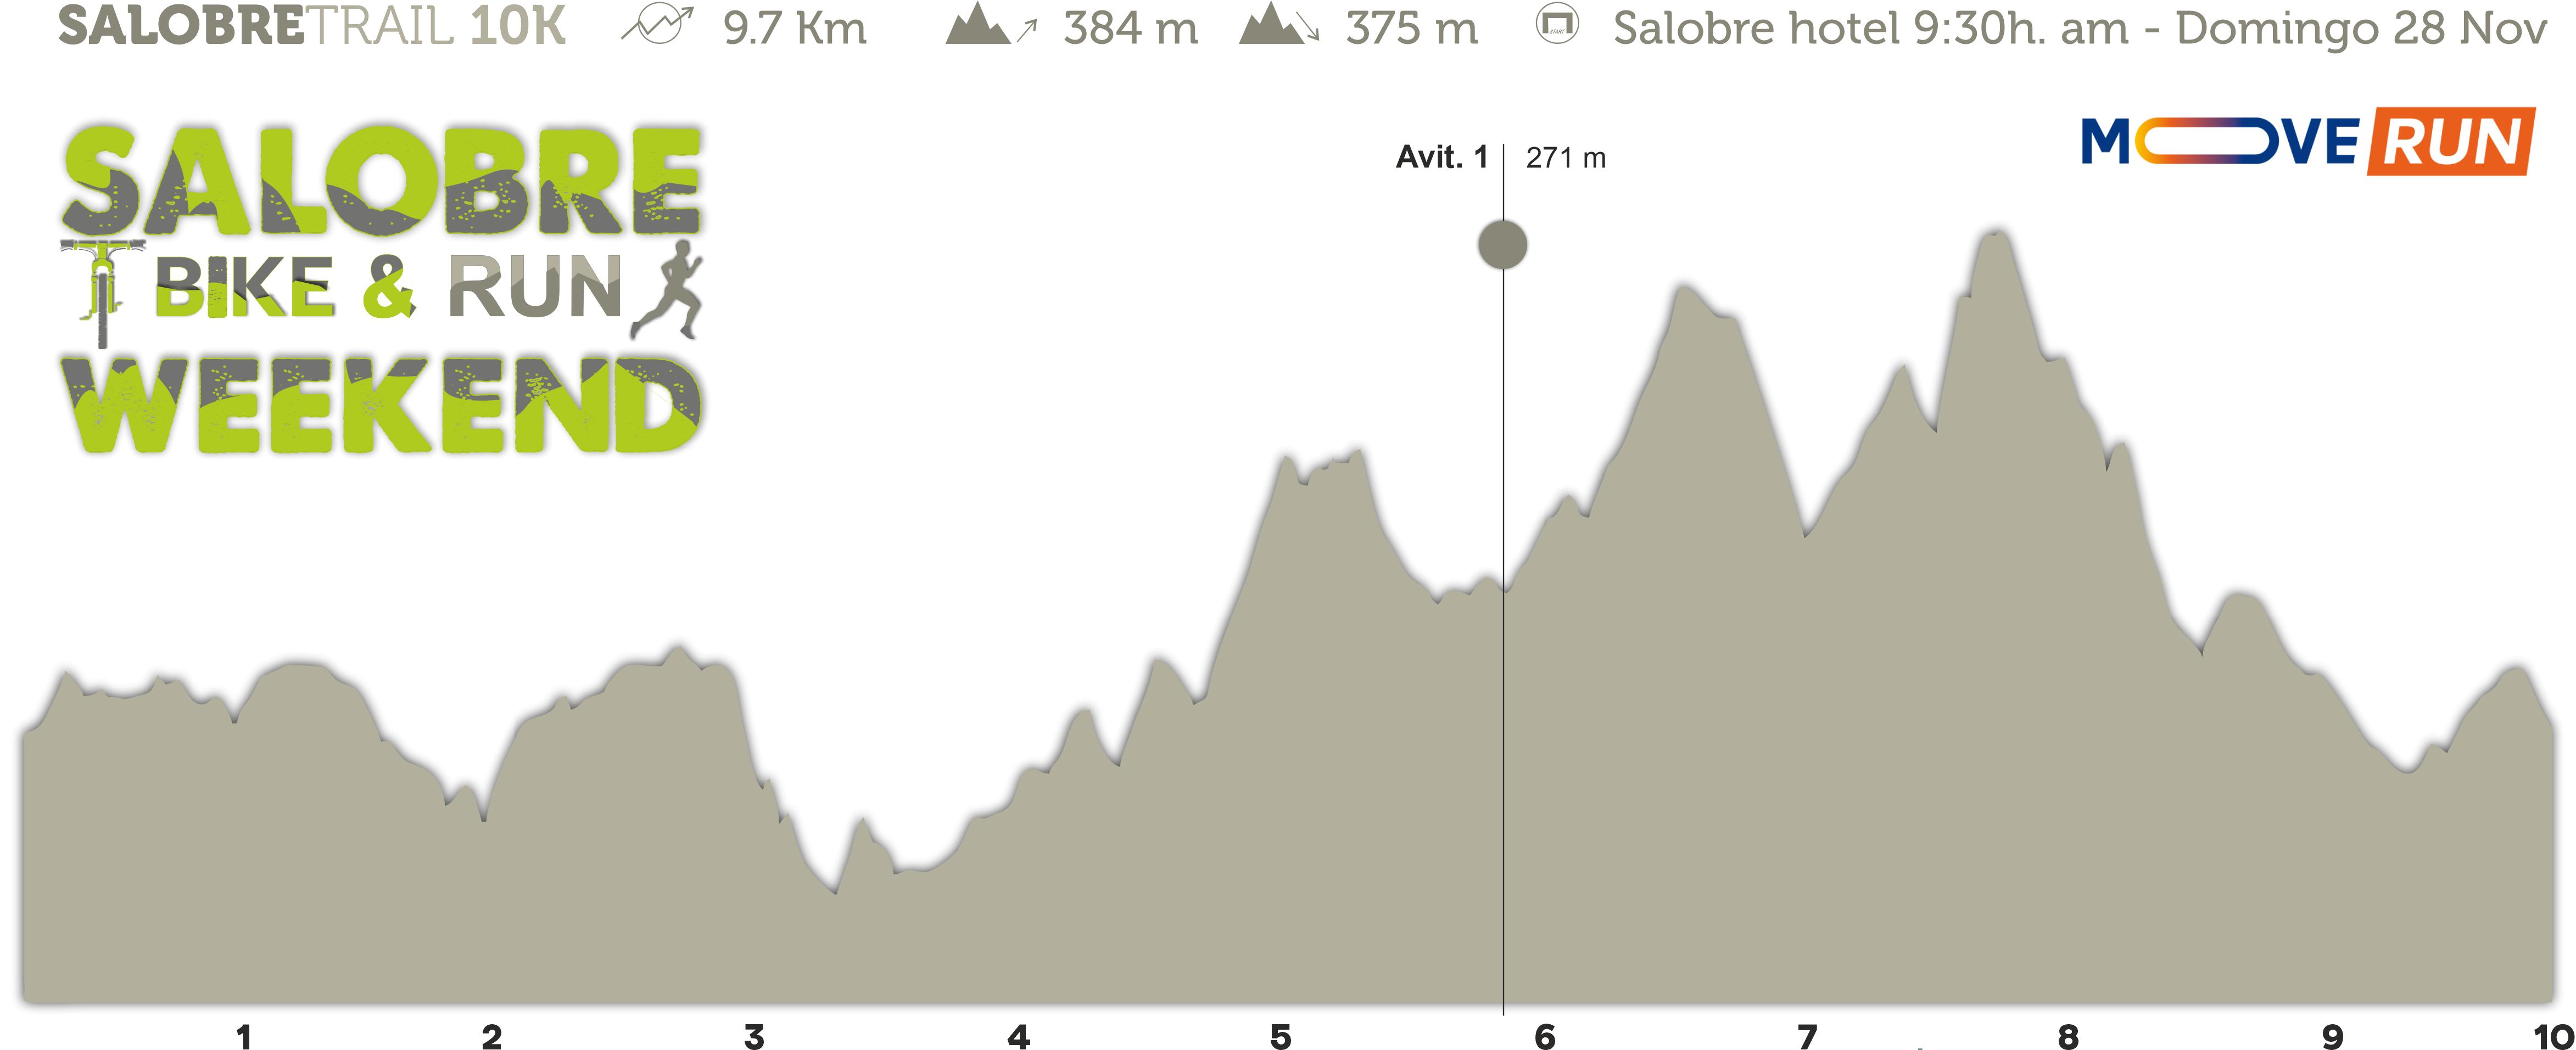 MoveRUN - SALOBRE BIKE&RUN WEEKEND Perfil TRAIL10